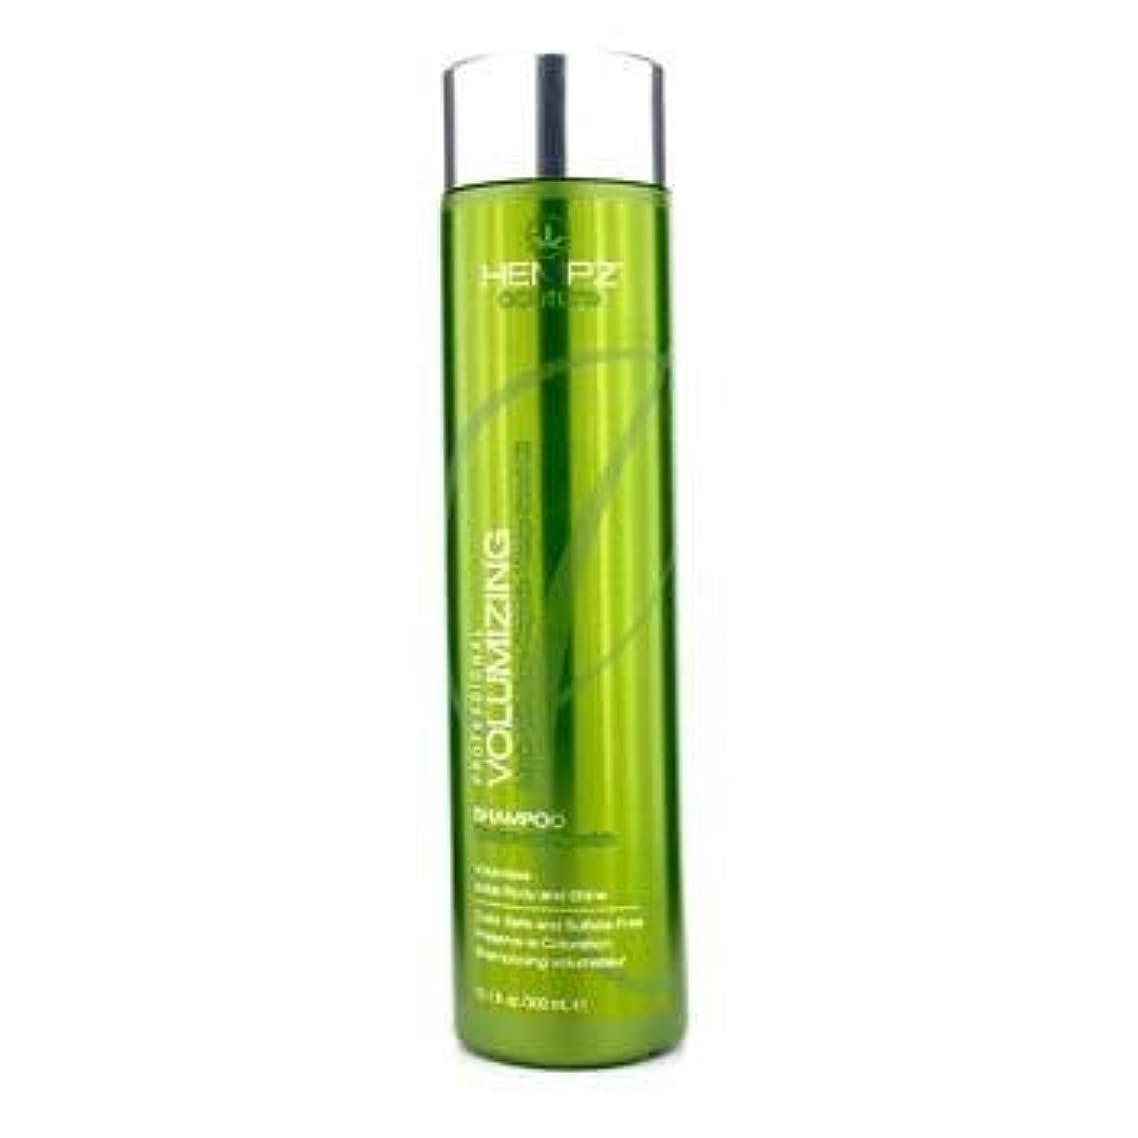 Hempz - Couture Volumizing Shampoo with Pure Organic Hemp Seed Oil (Thicken and Nourish) - 300ml/10.1oz